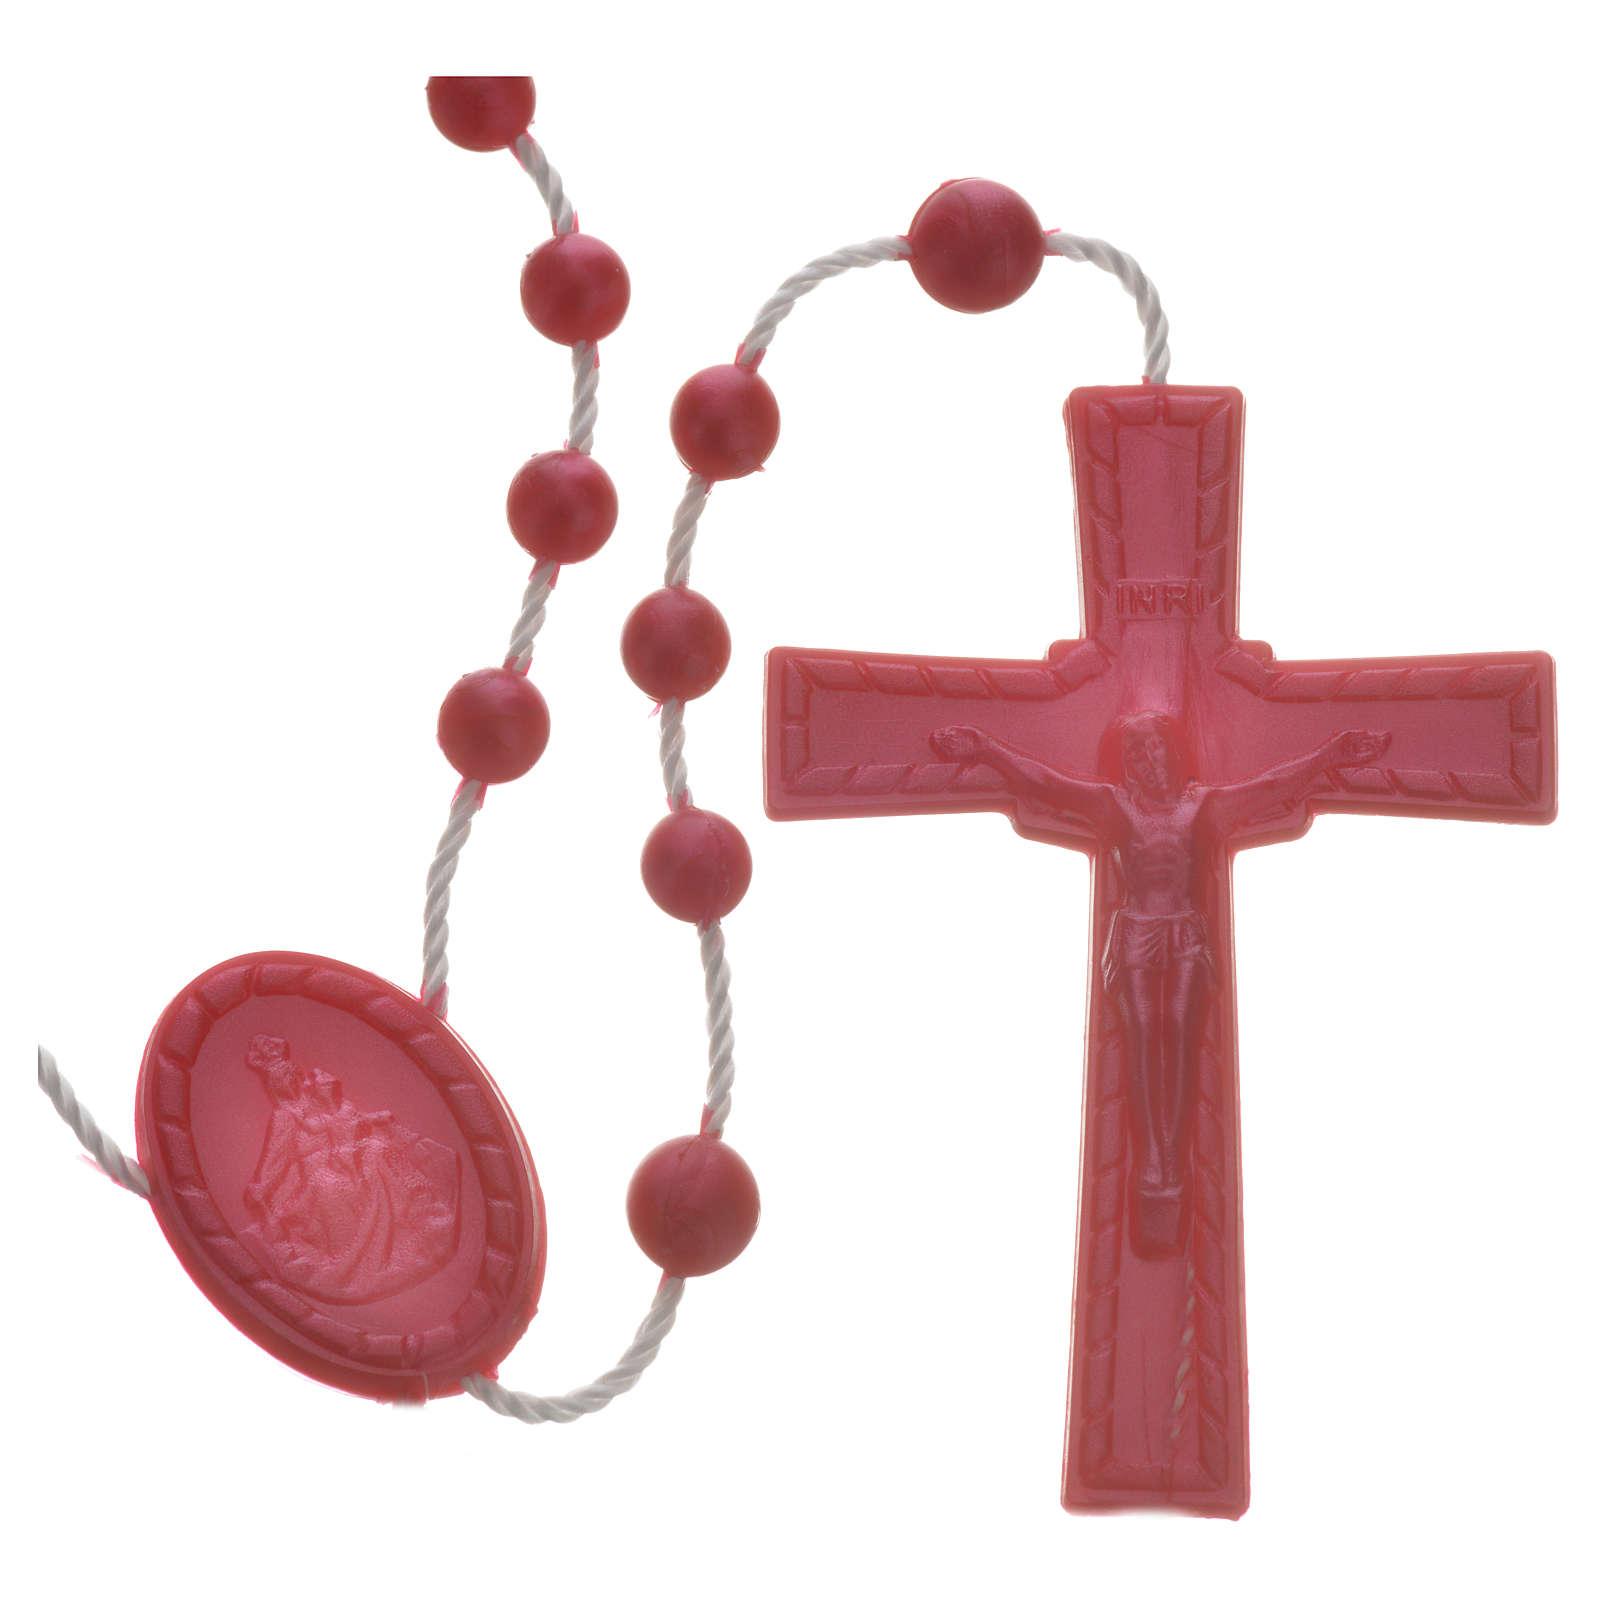 Rosario nailon perlado rojo 4